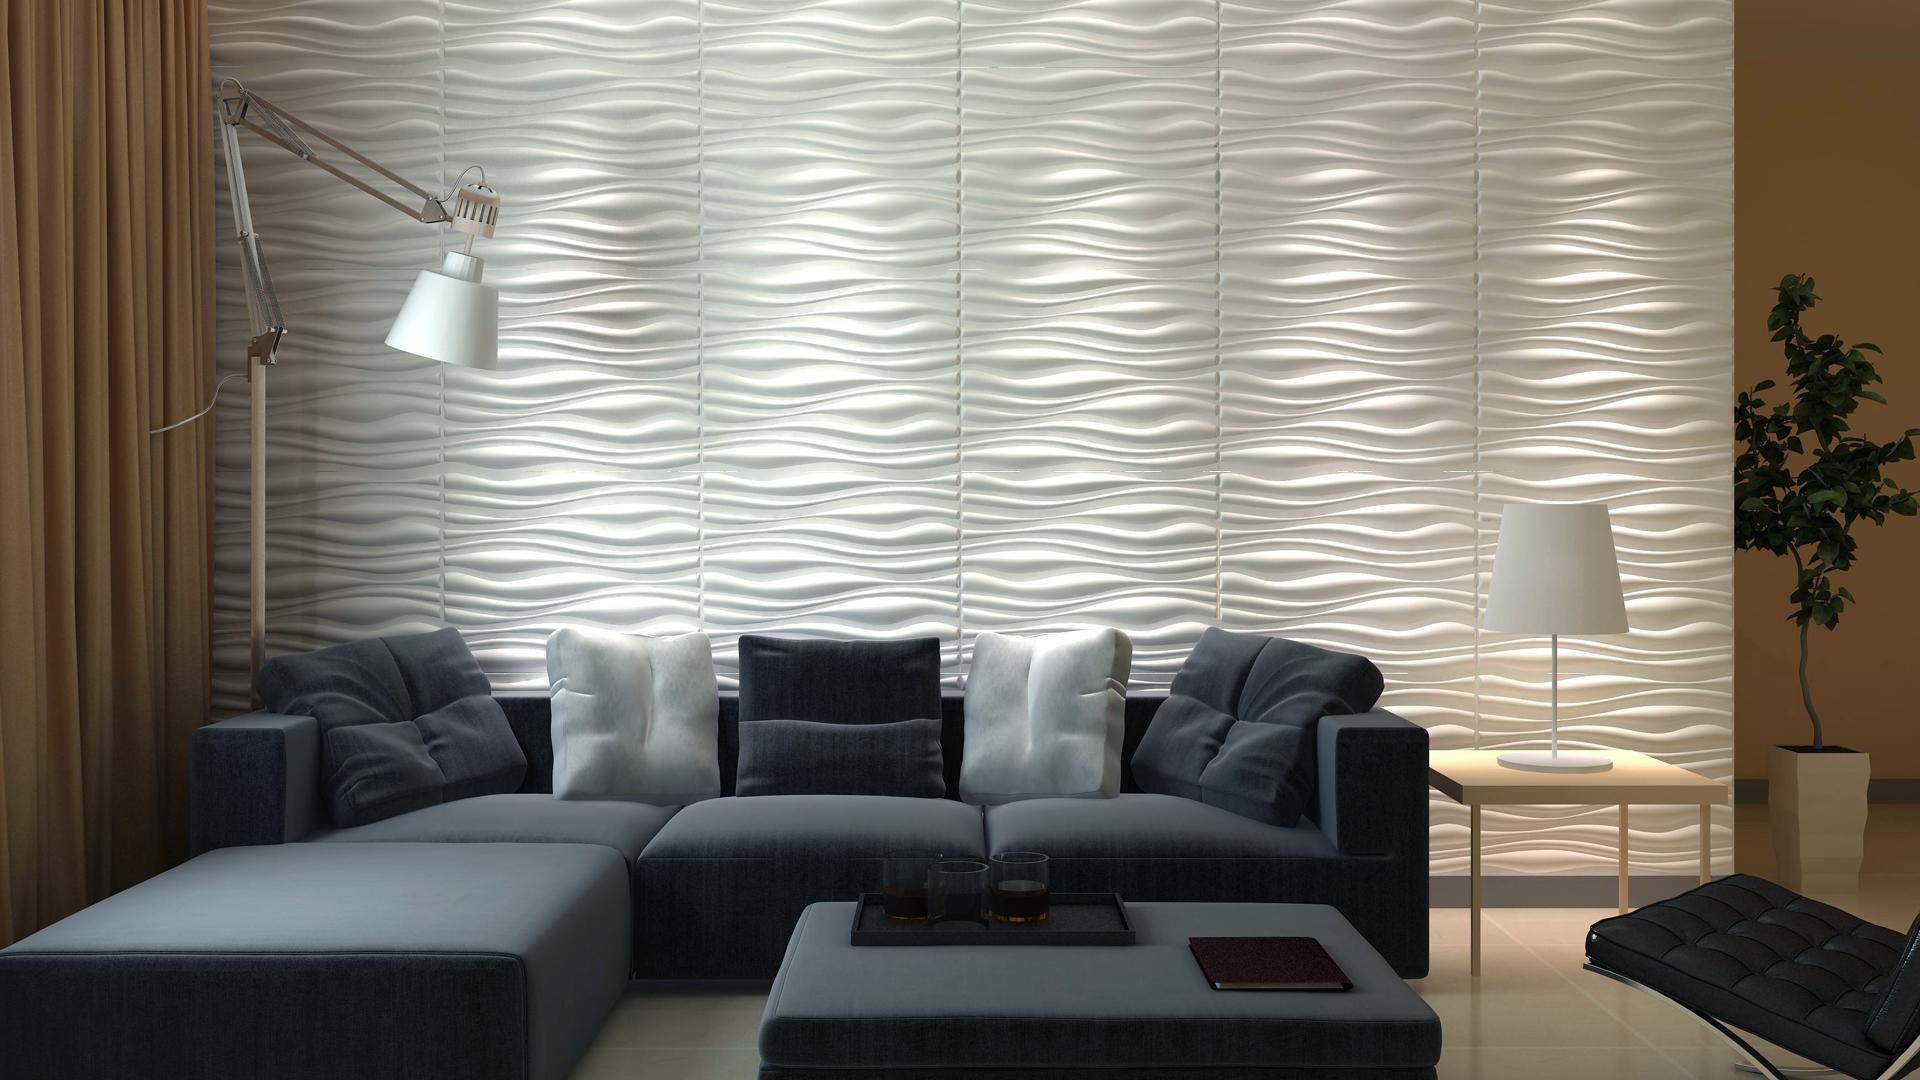 3D Wandpaneele - Produkte - Inreda - Deckenpaneele - 3D Tapeten - Wandverkleidung